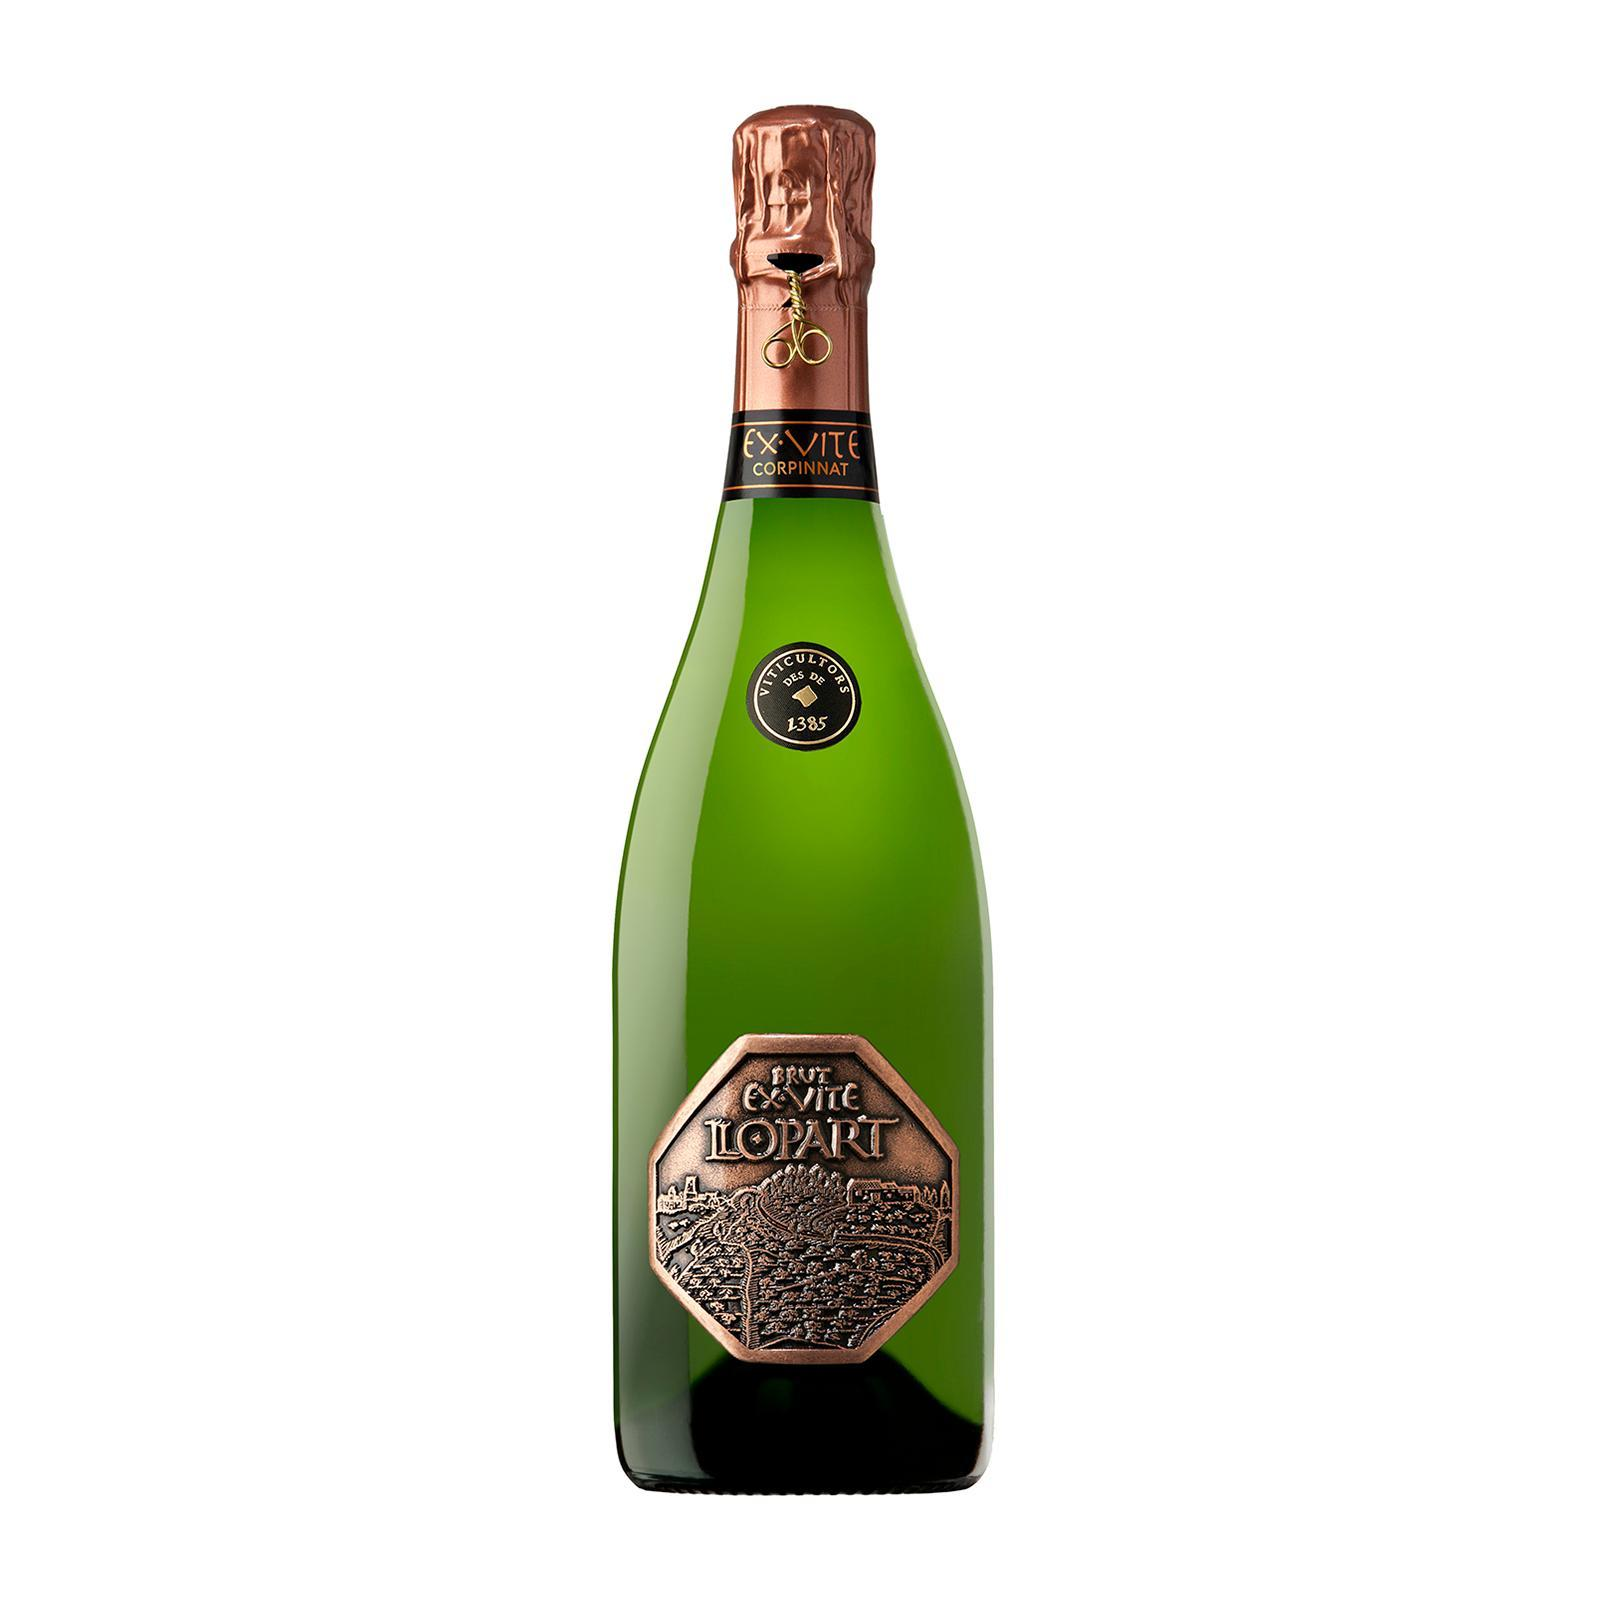 Llopart 1887 Ex Vite Brut Gran Reserva Cava 2010 Organic Spanish Wine - By TANINOS